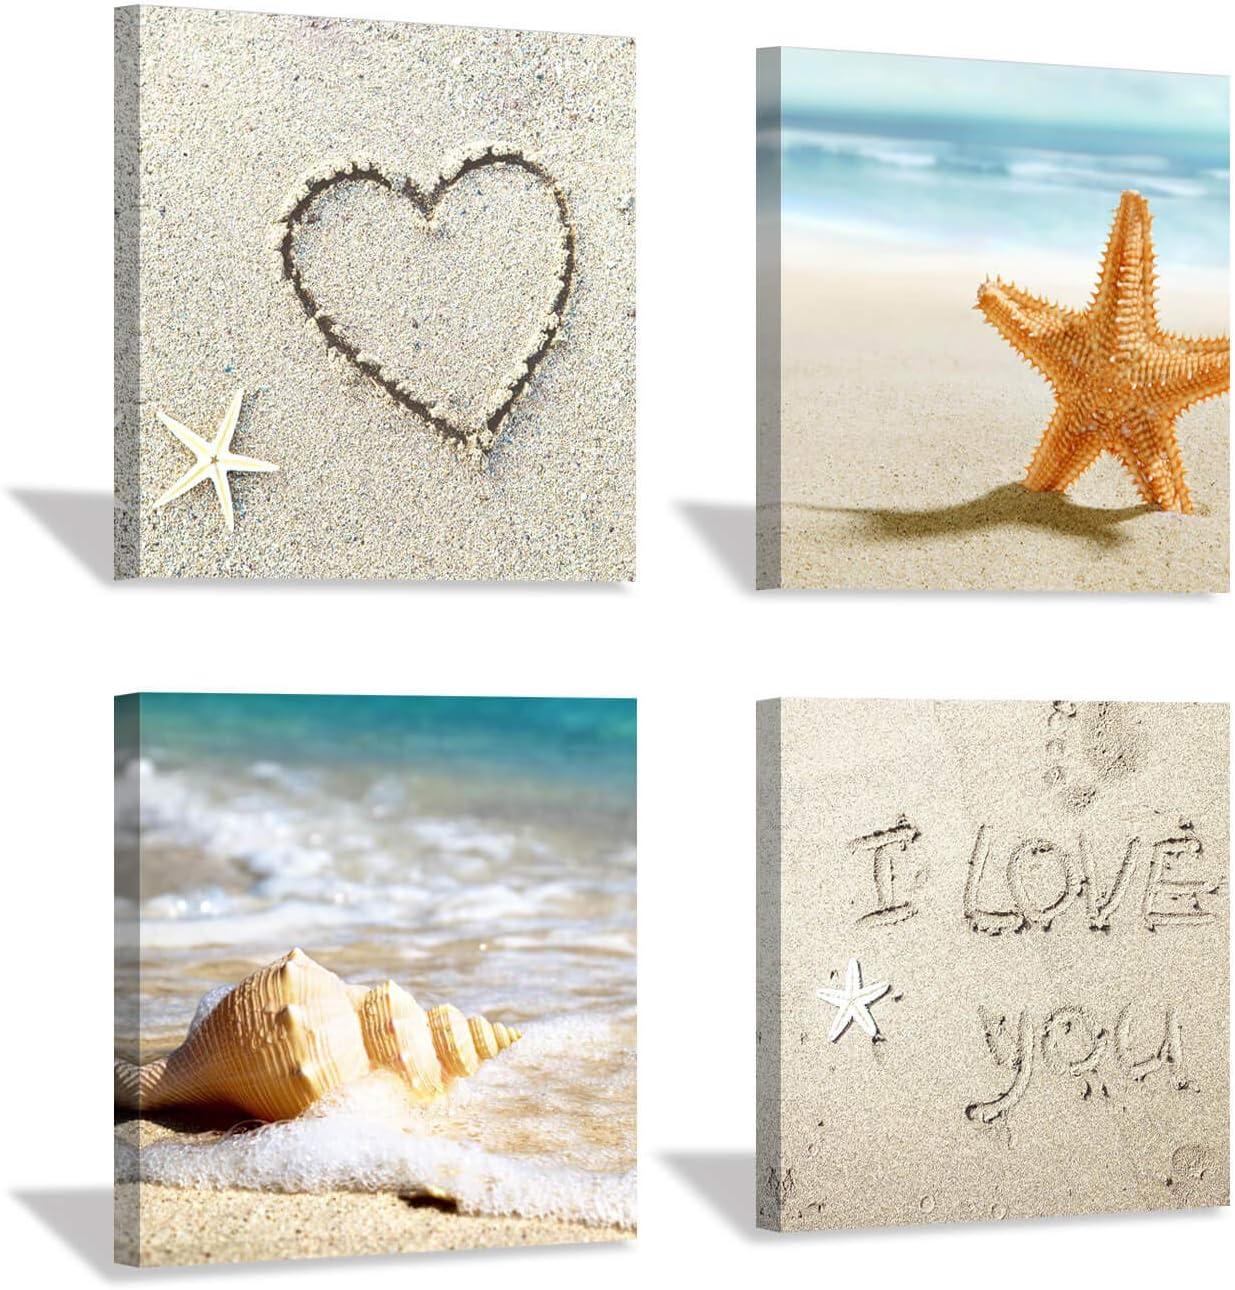 "Coastal Beach Canvas Wall Art: Sandy Seashell and Starfish Painting Print on Canvas for Bathroom Wall Decor (12"" x 12'' x 4 Panels)"